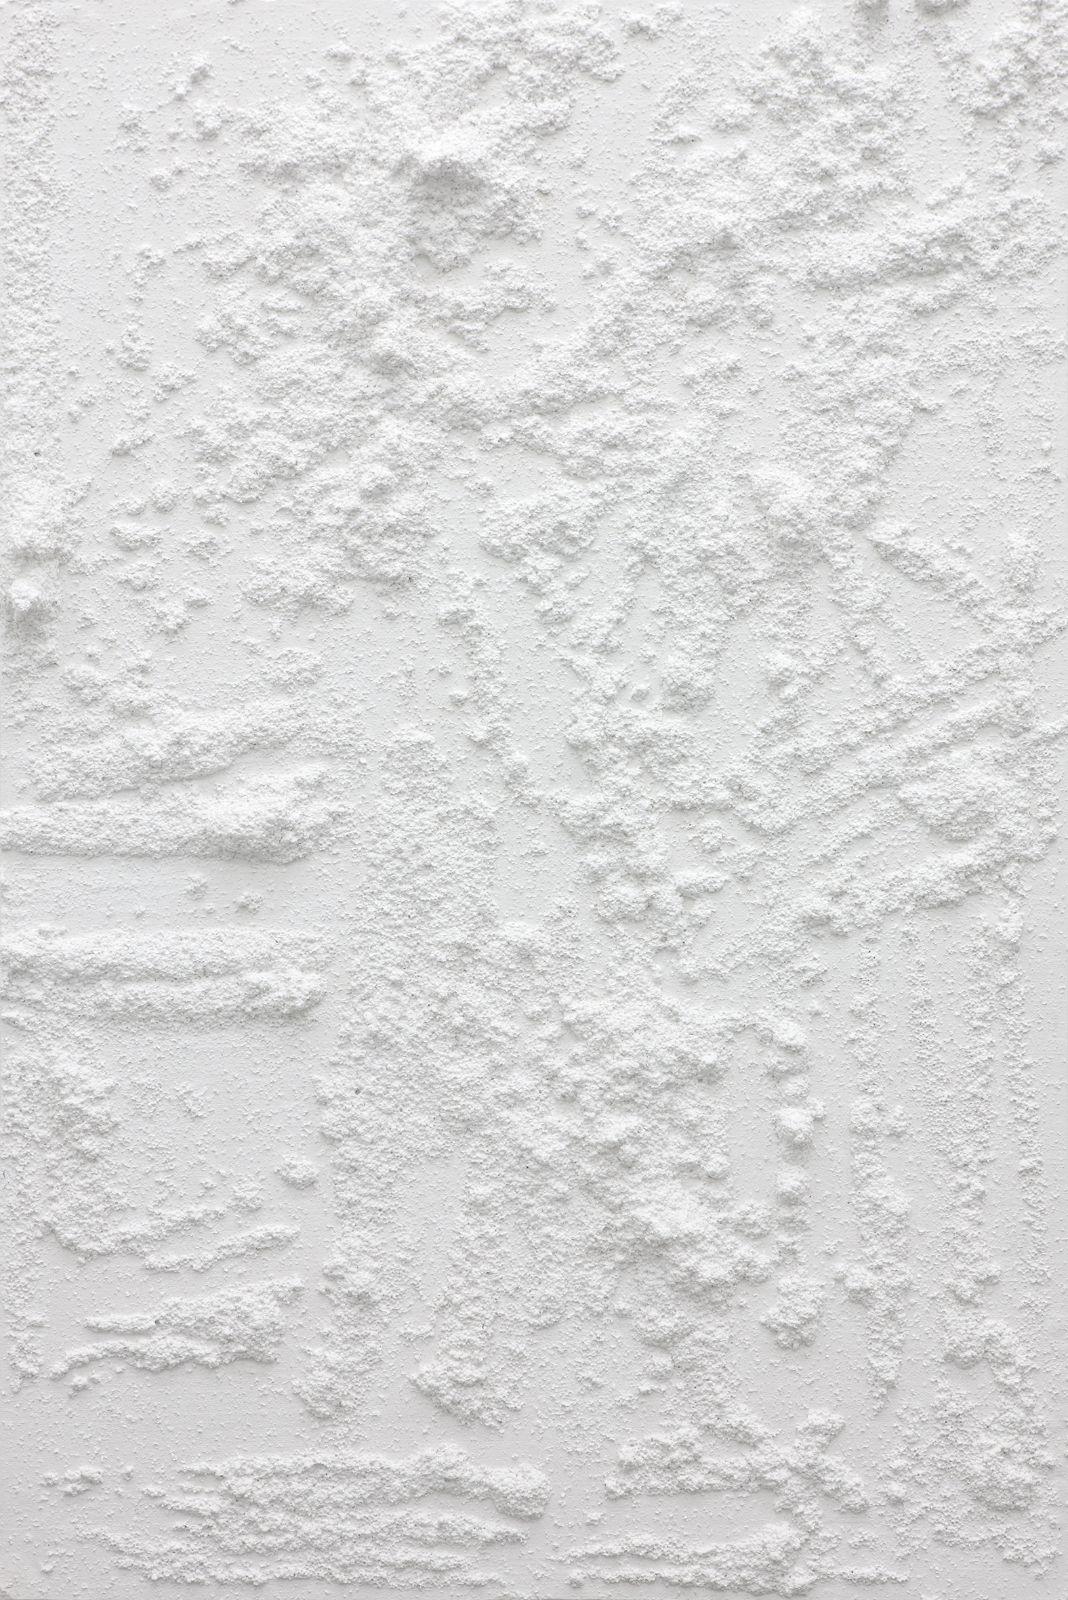 Untitled, 2013, plaster, 150 x 100 x 11 cm